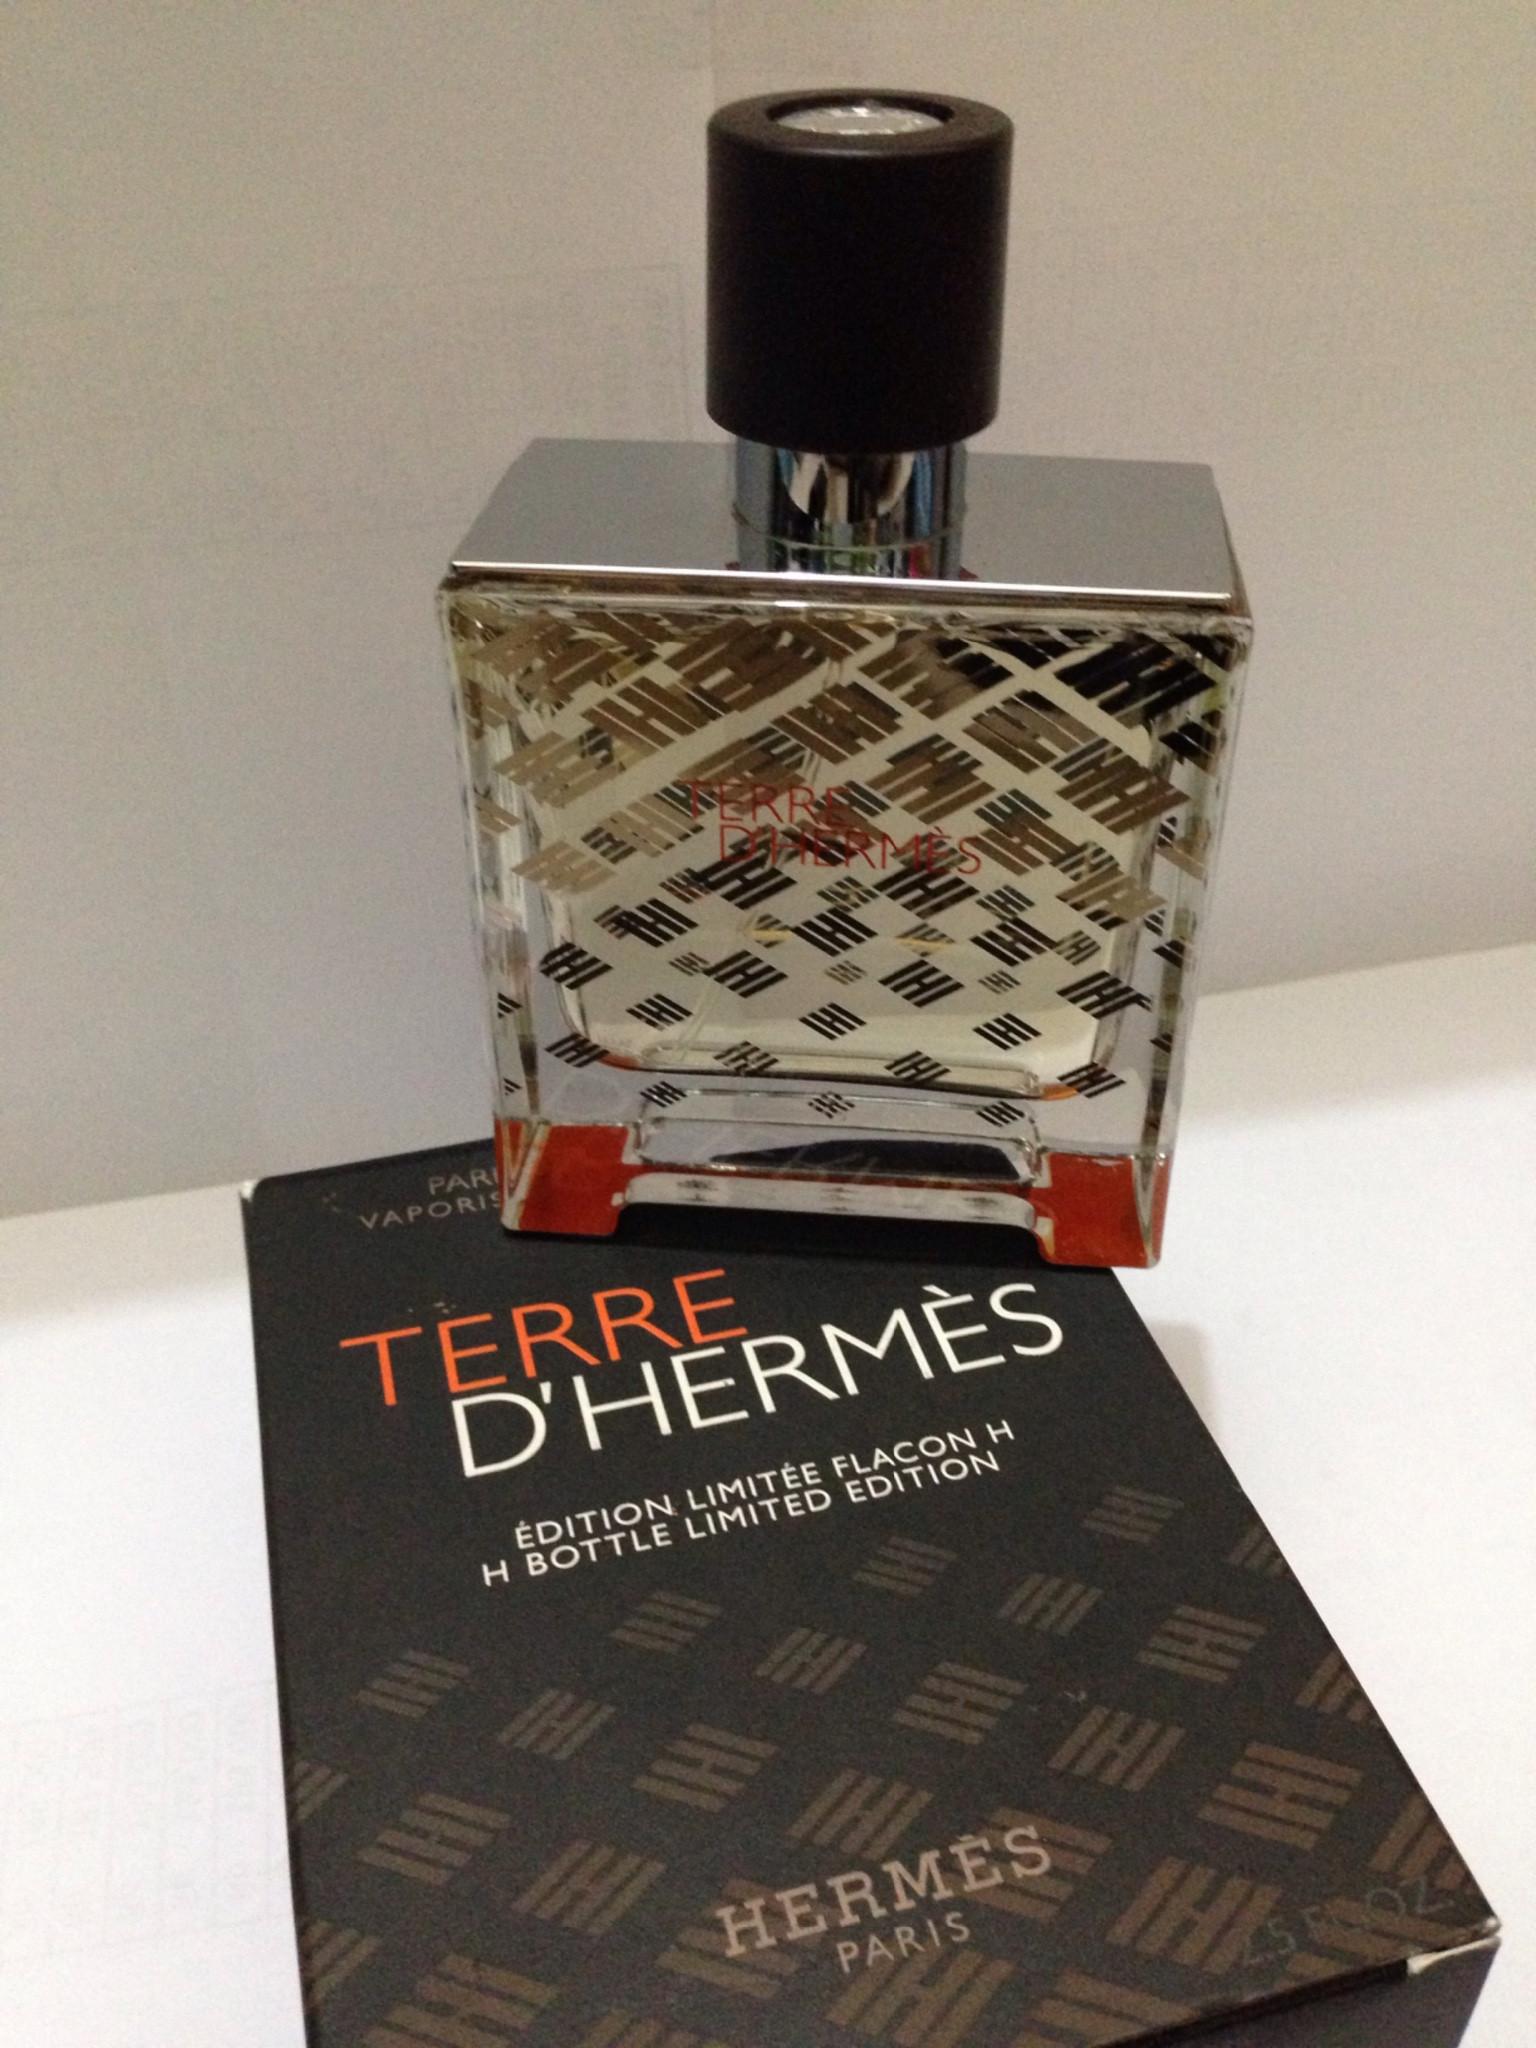 Jual Hermes Tere Dhermes Edp Palumigade Smart Shop Tokopedia Terre D Parfum Flacon H 2014 For Men 75ml